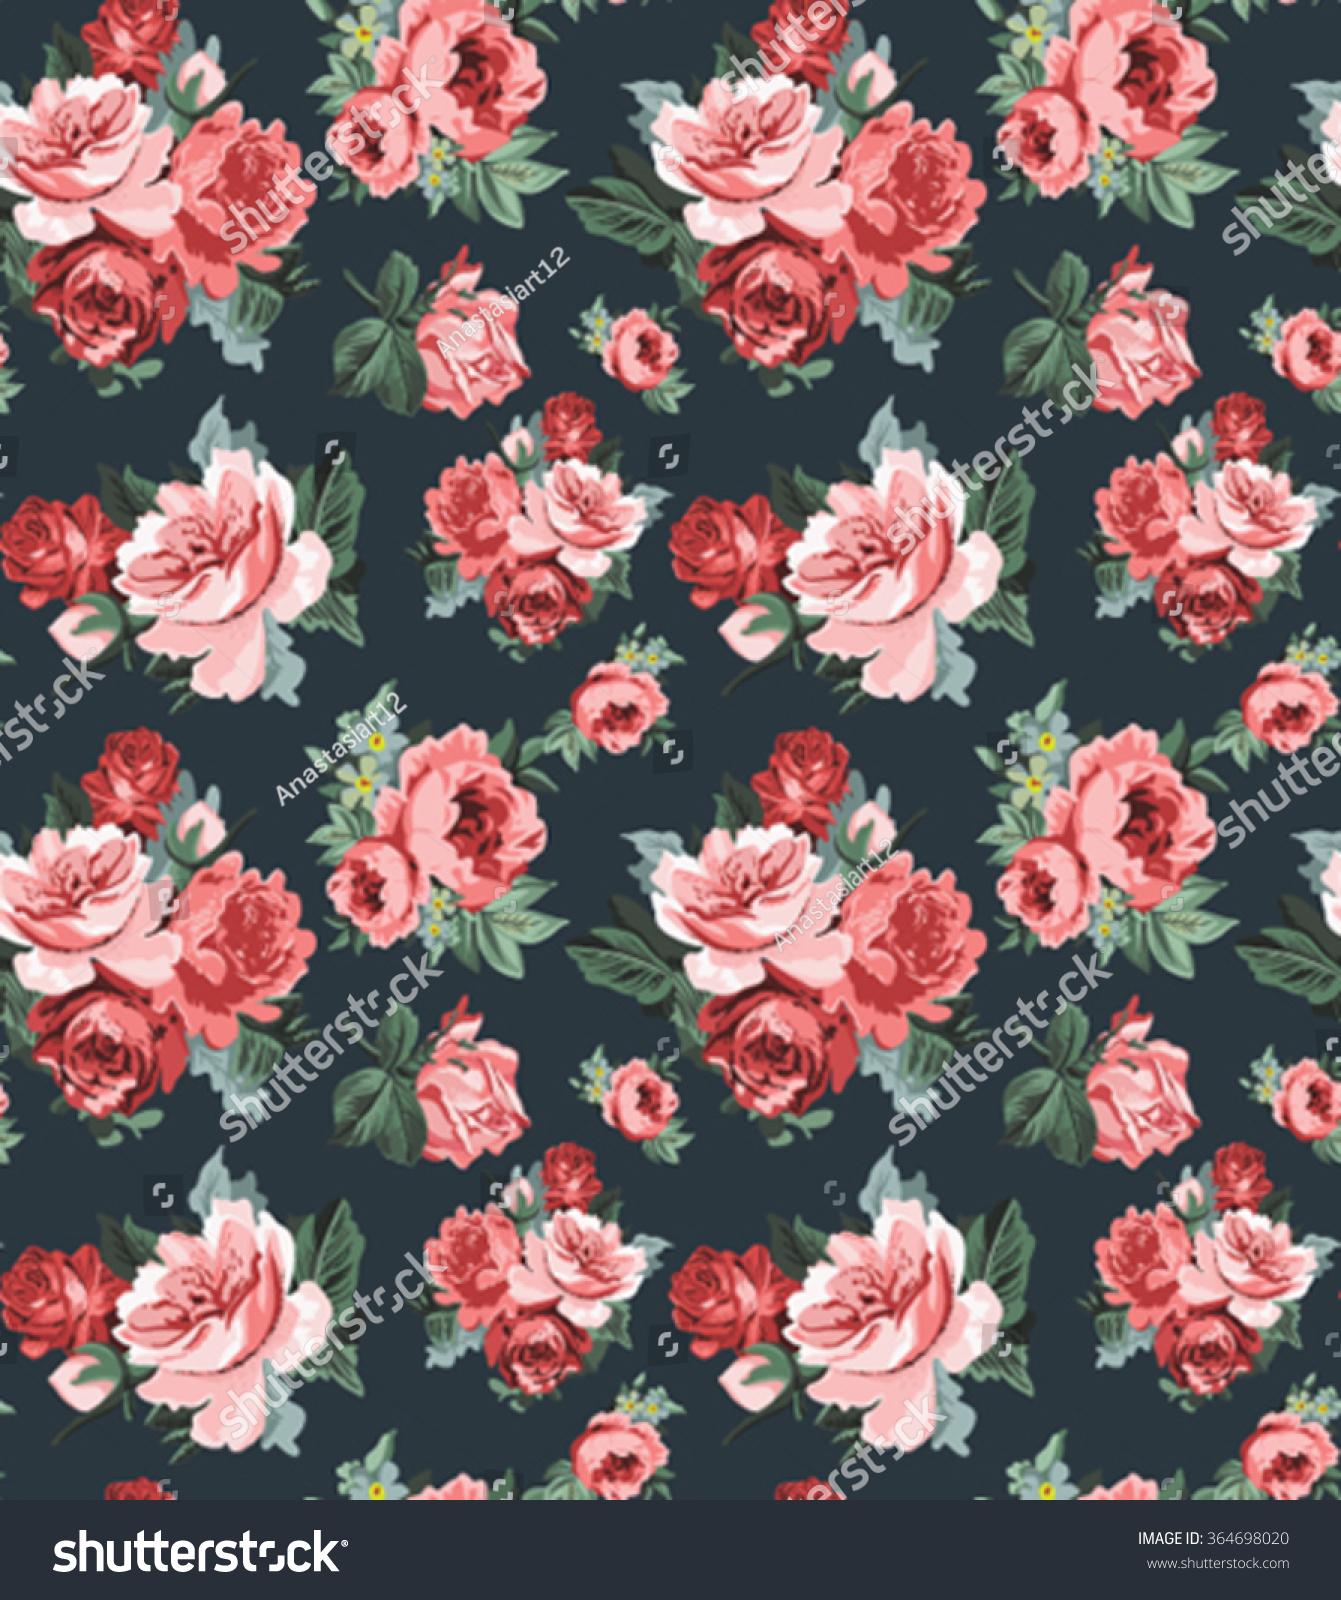 Vintage Rose Wallpaper Repeat Stock Vector Royalty Free 364698020